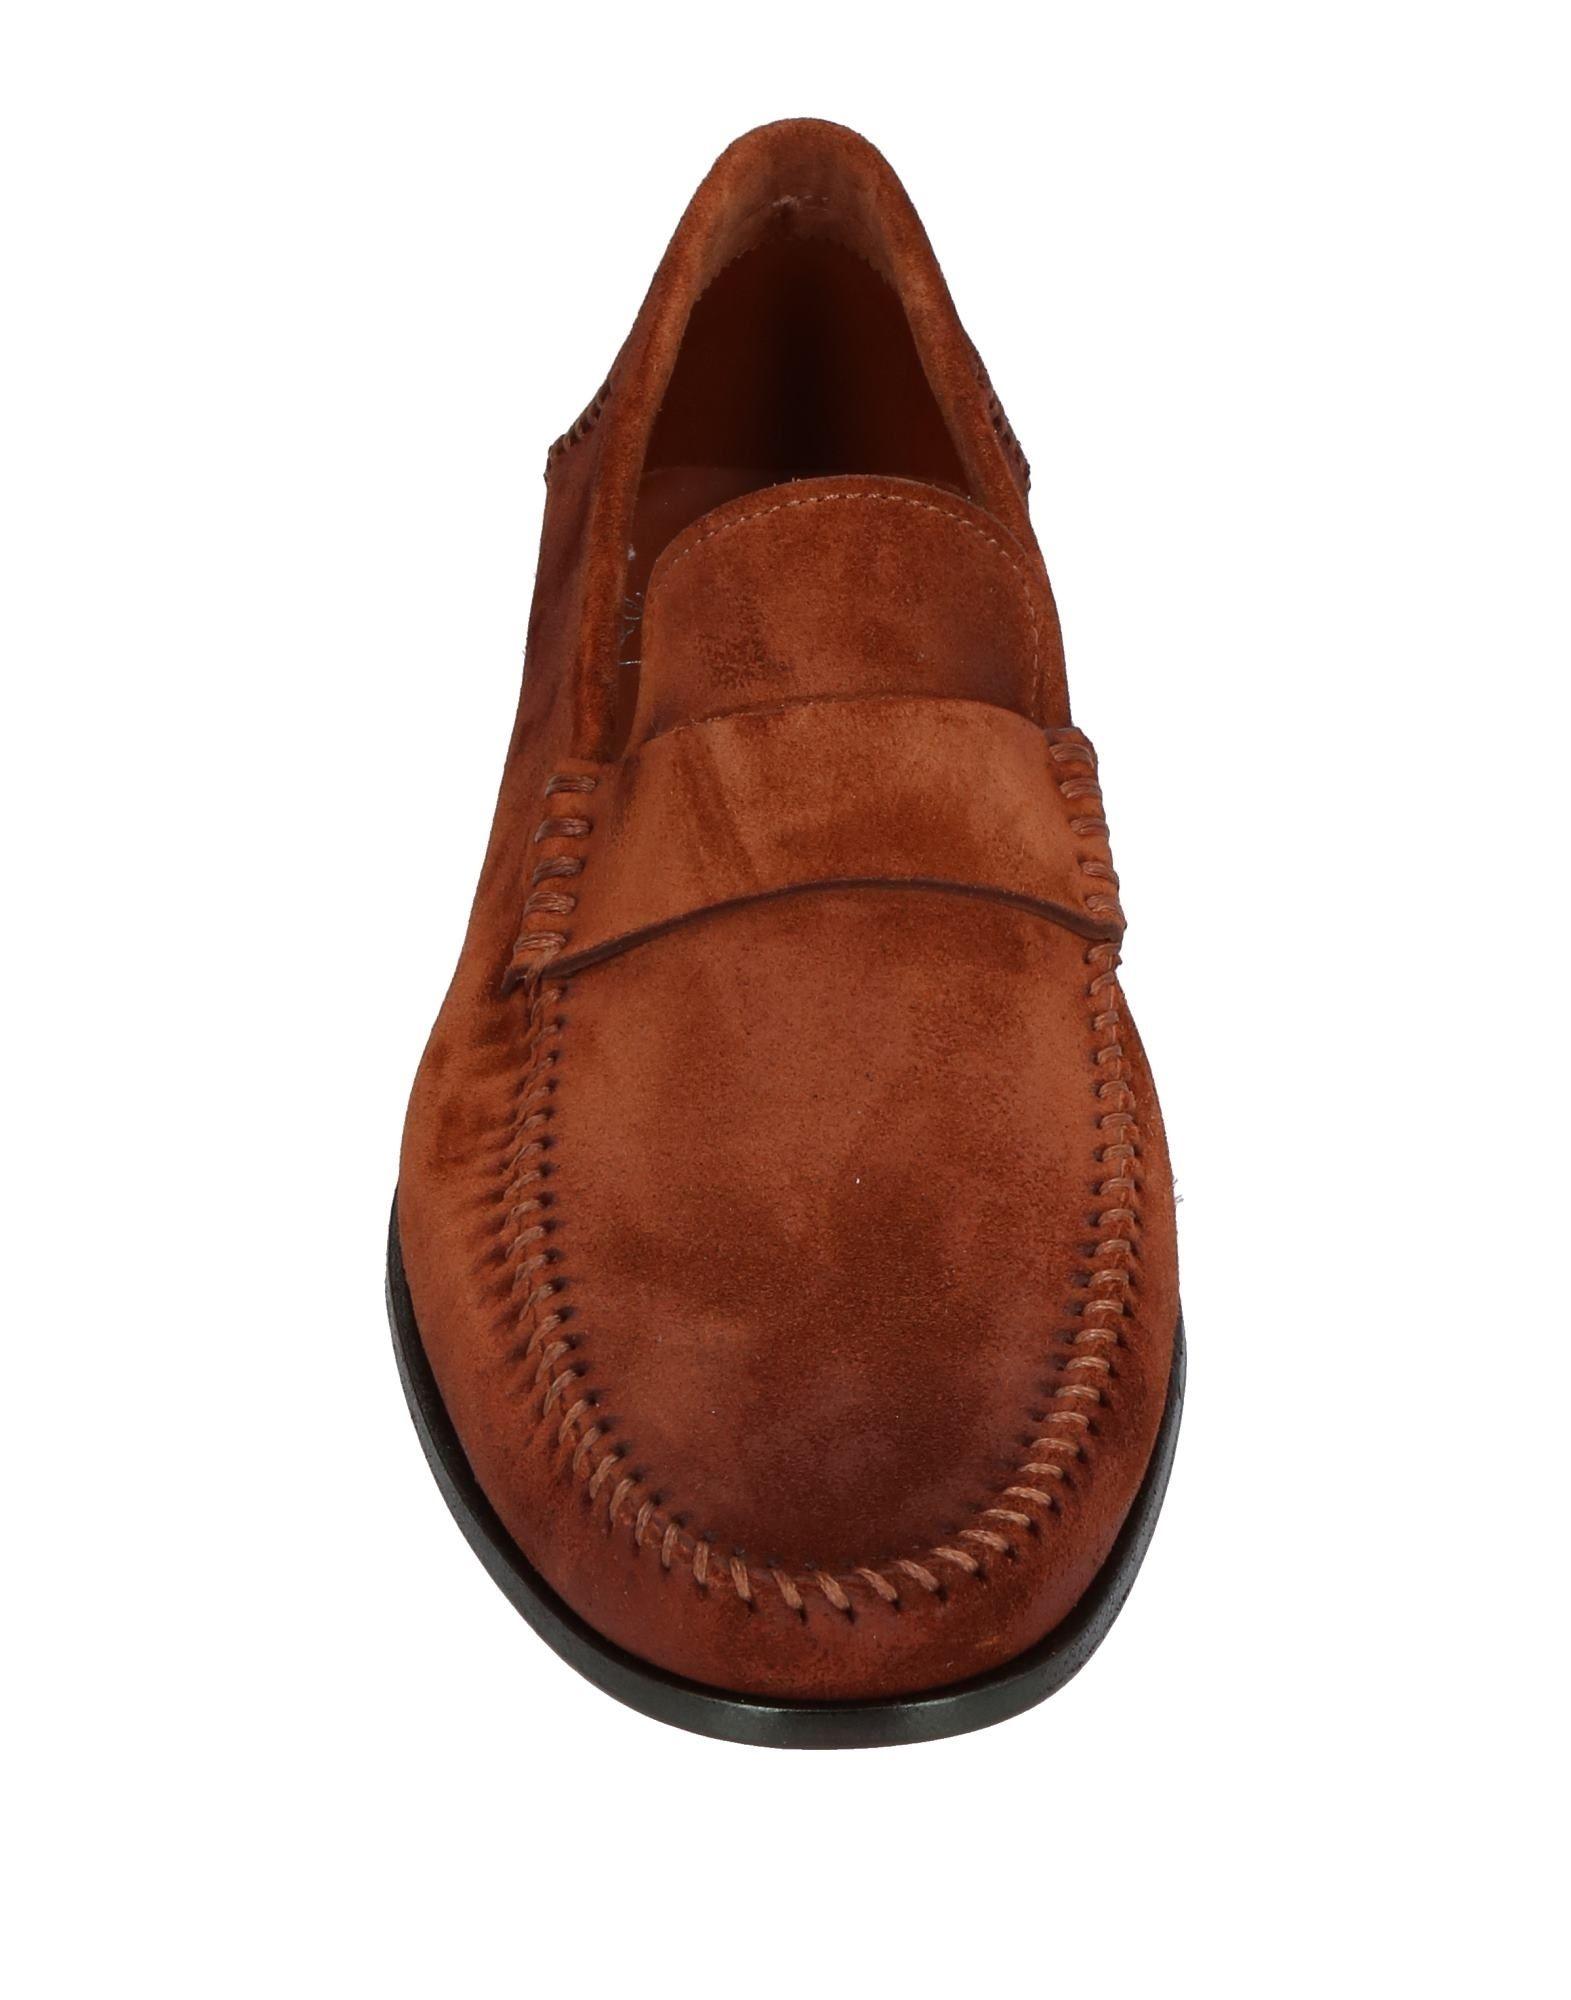 11409734HB Santoni Mokassins Herren  11409734HB  Heiße Schuhe 967911